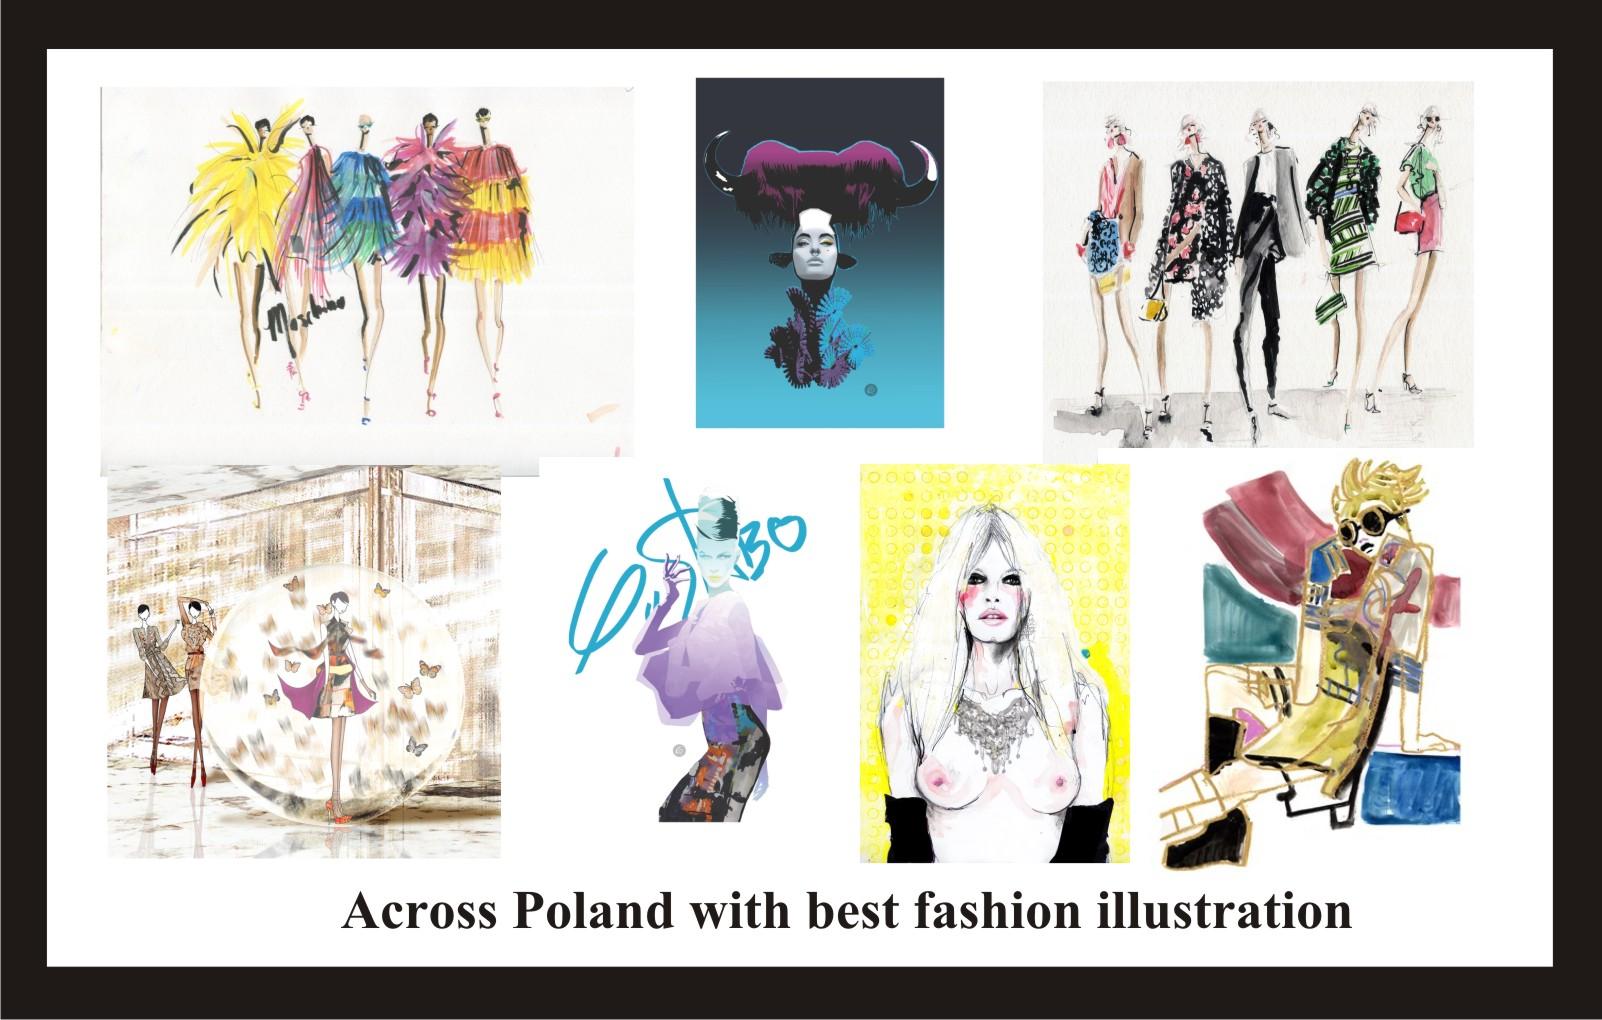 across-poland-fashion-illustration-2